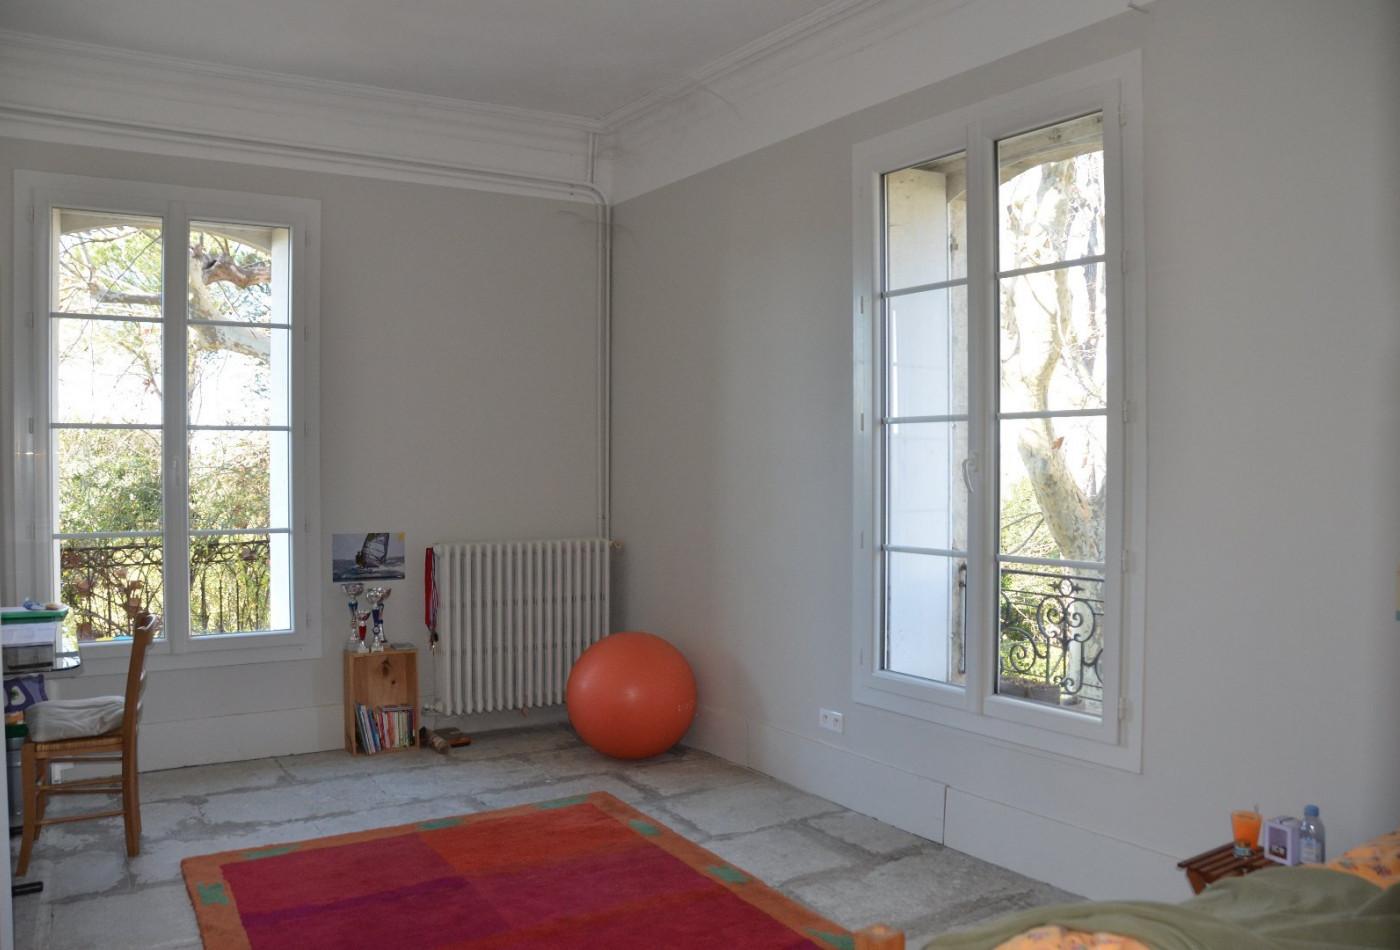 A vendre  Montpellier | Réf 340138044 - Agence galerie casanova